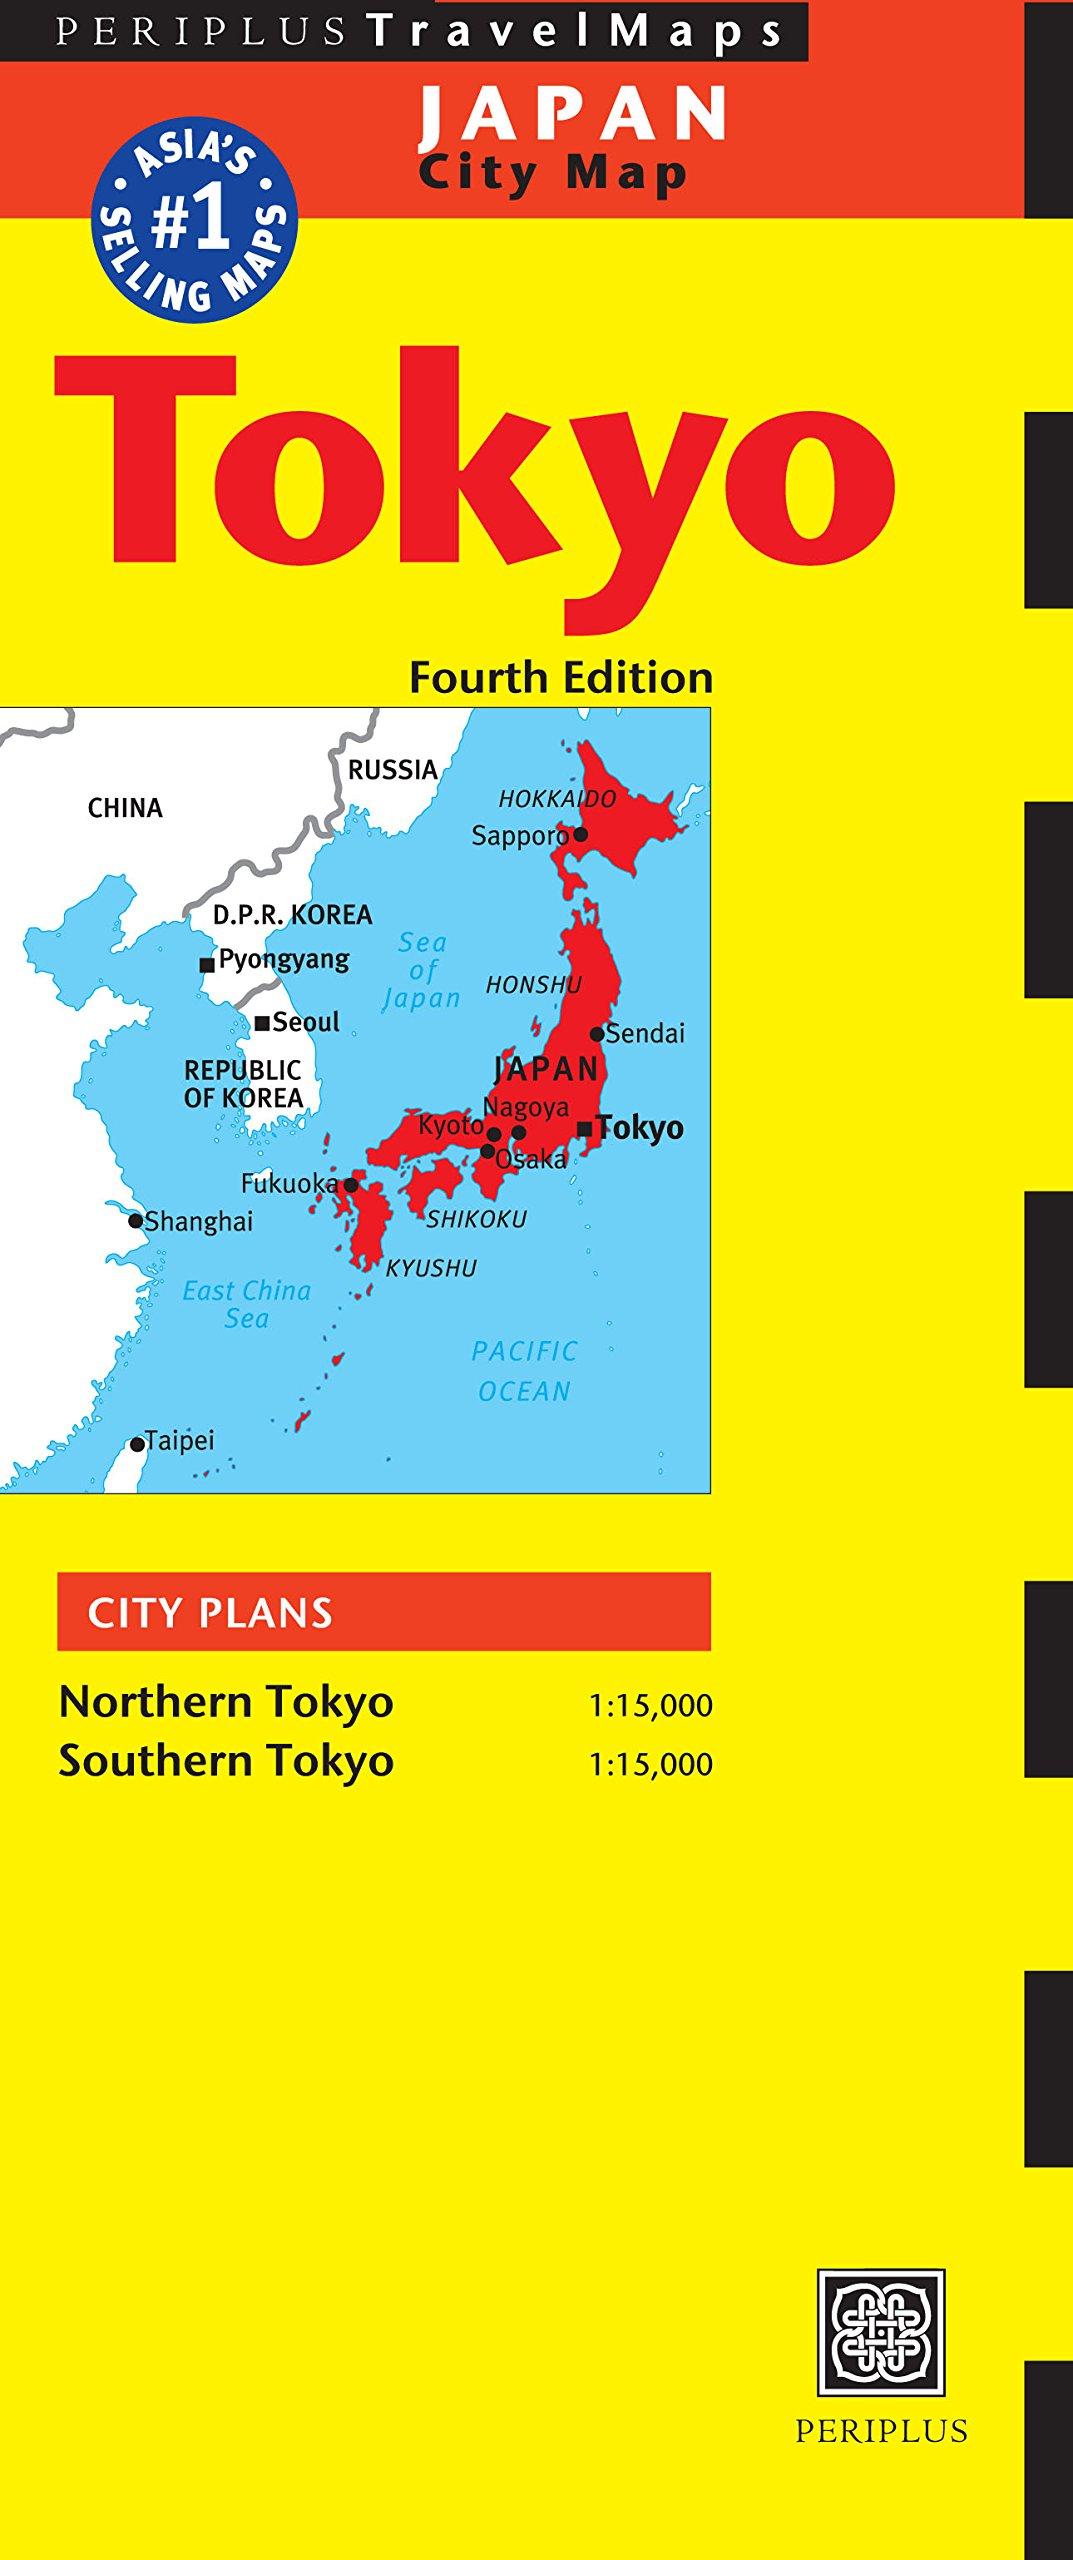 Tokyo Travel Map (Periplus Travel Maps)